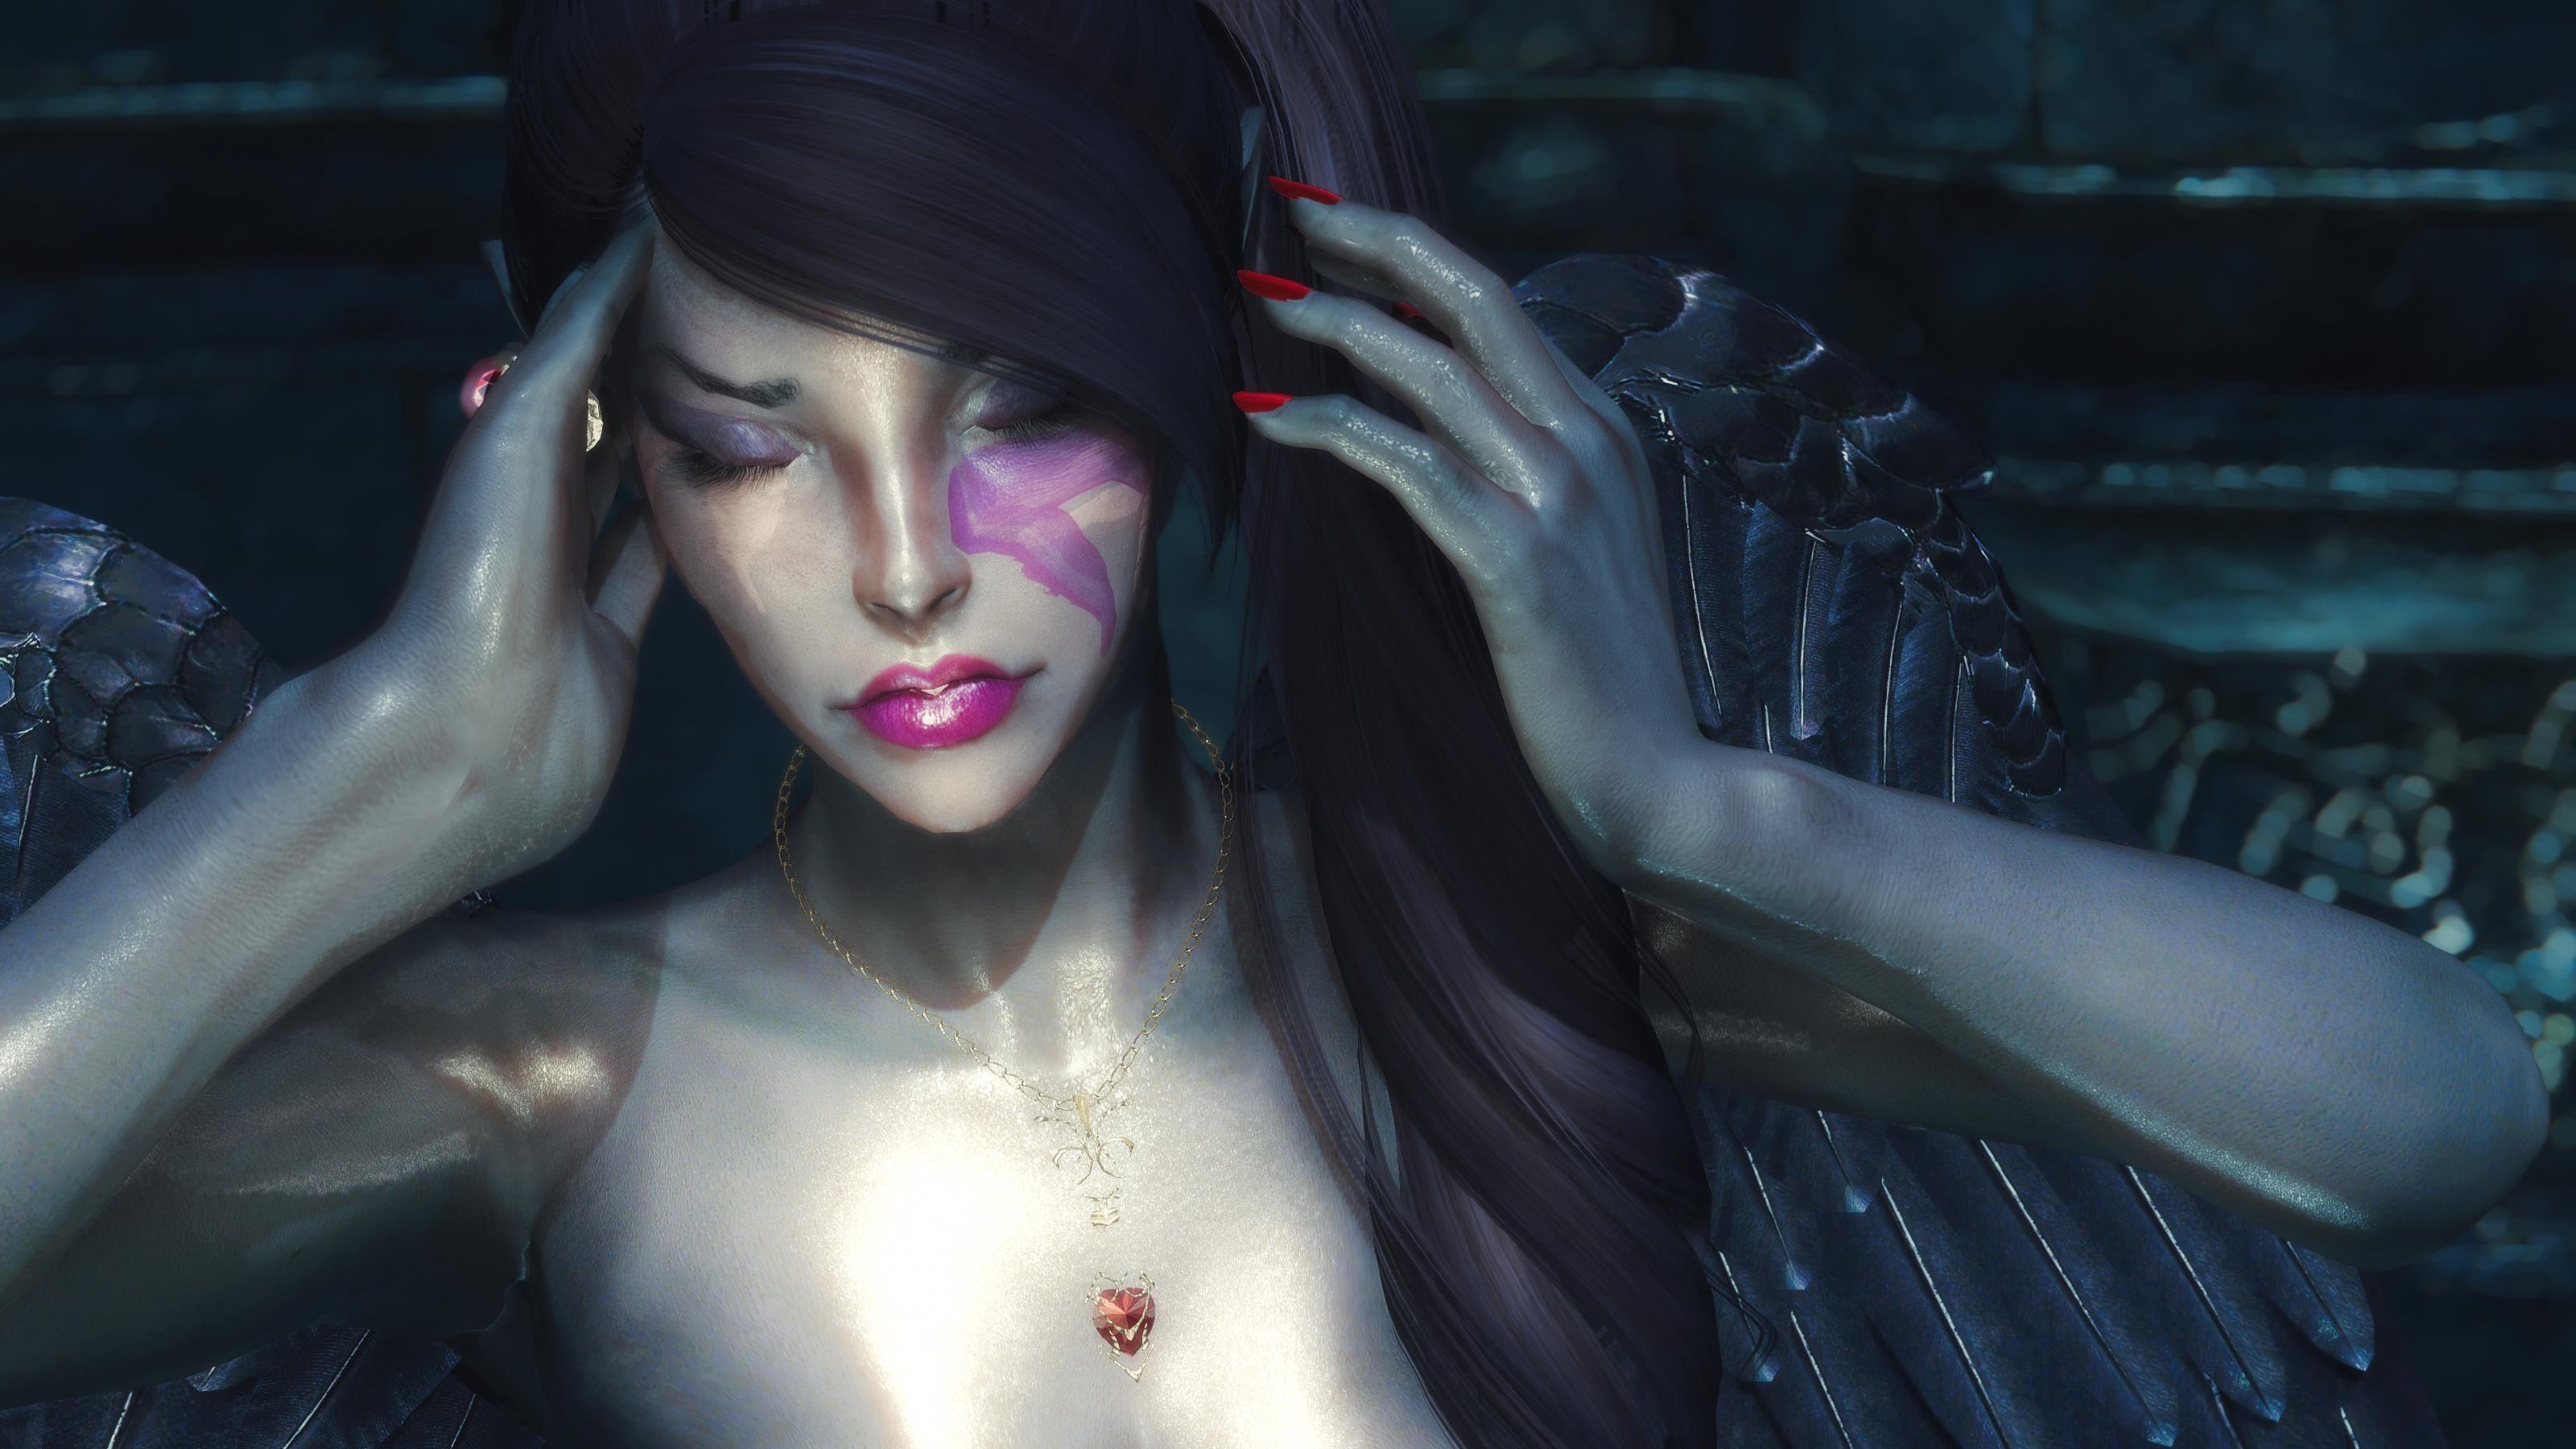 Hd nude wallpaper fantasy girl the